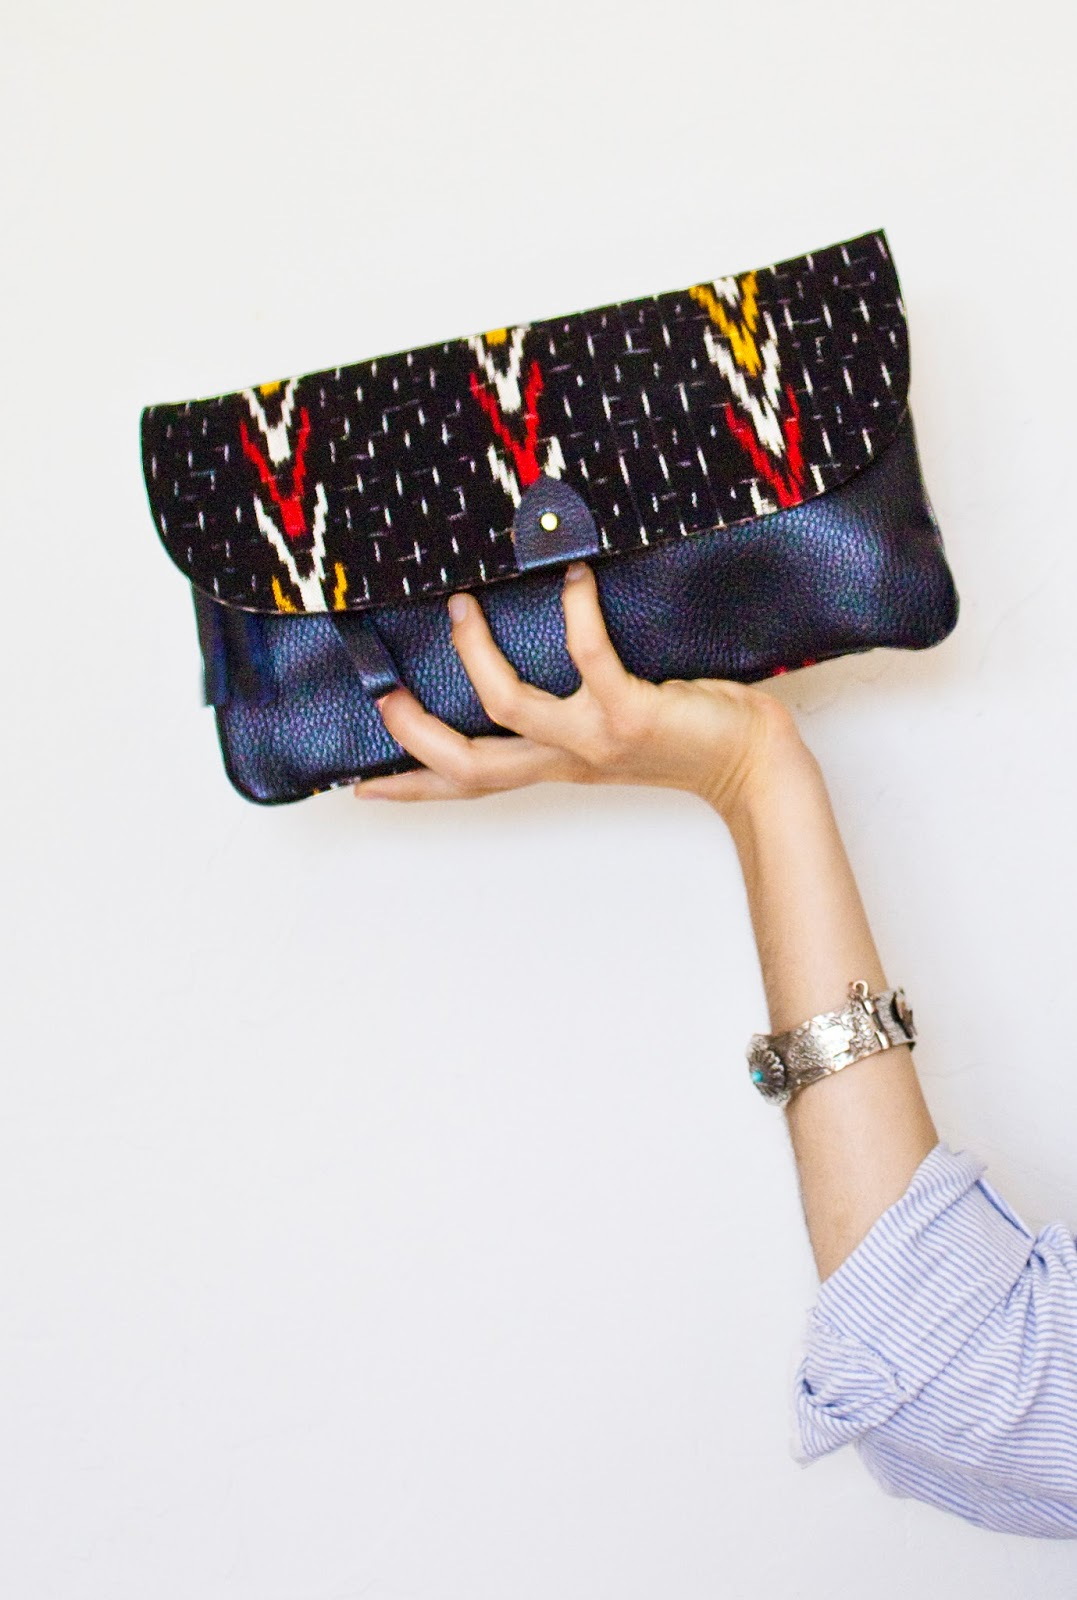 eco leather, fair trade fashion, ethical fashion, ethical fashion blog, ethical fashion editorial, tribal clutch, India fair trade